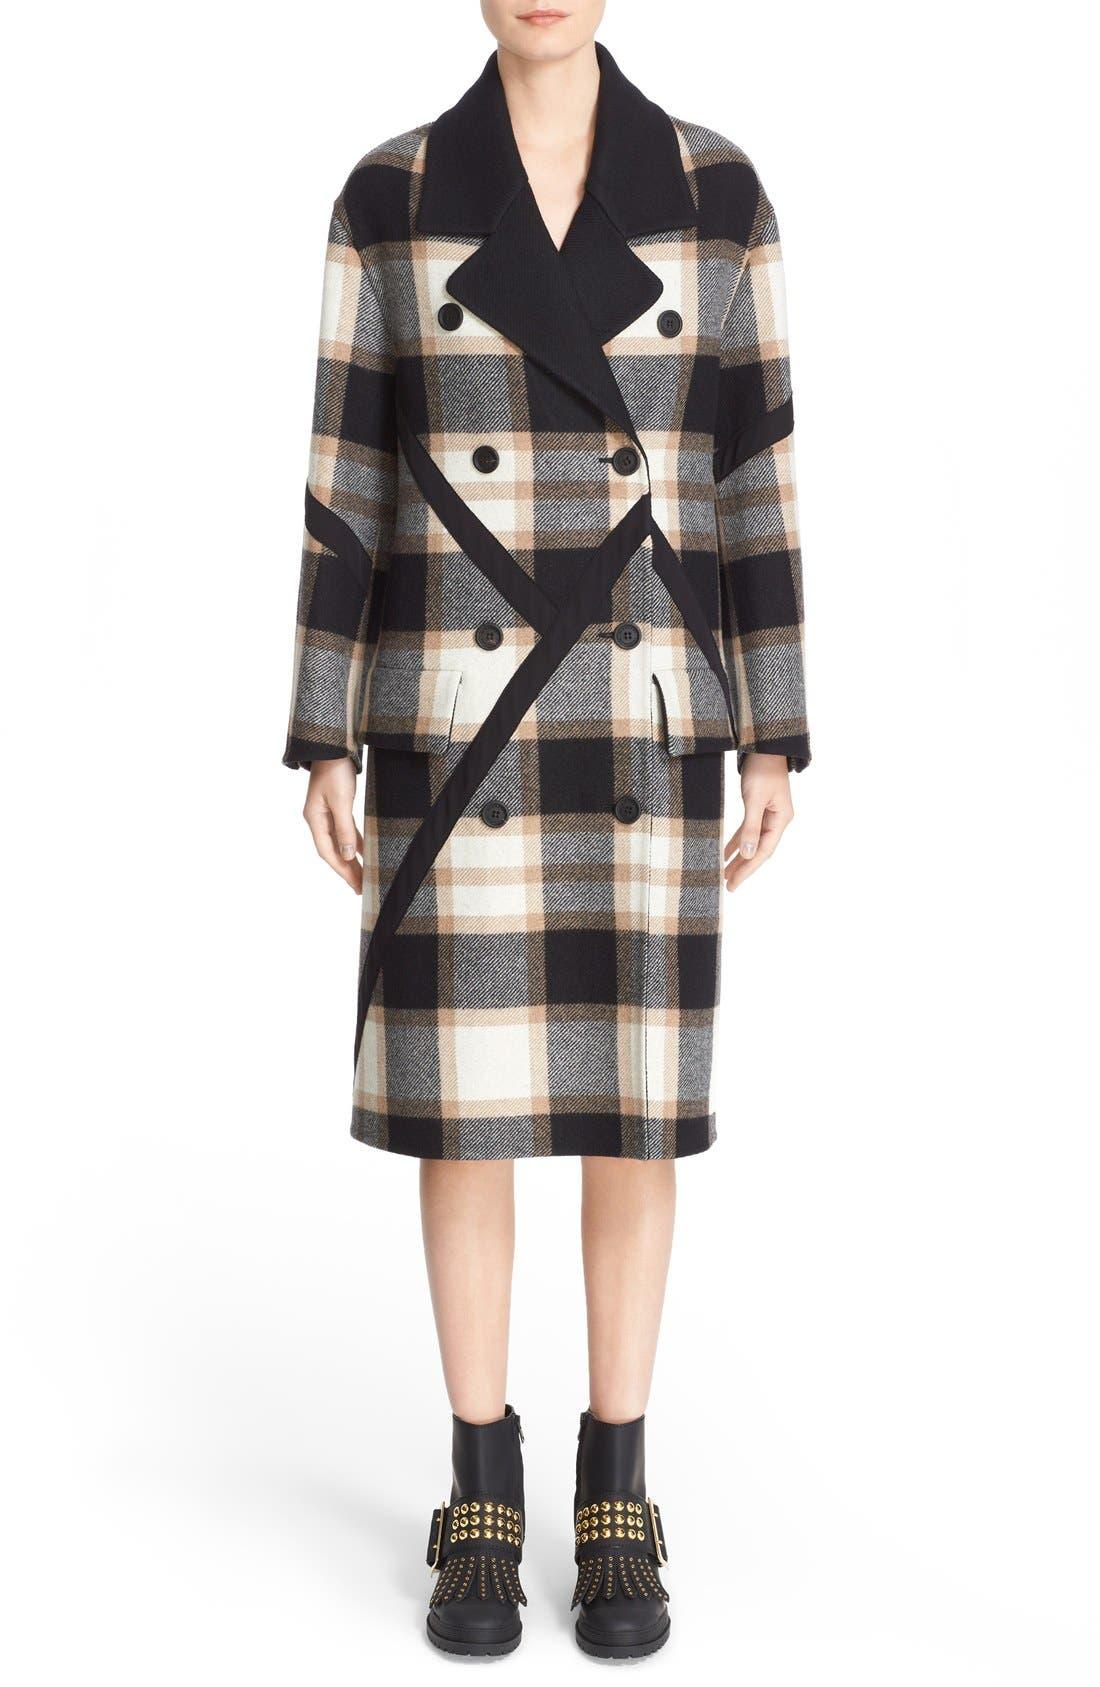 Alternate Image 1 Selected - Burberry Tartan Plaid Wool Coat